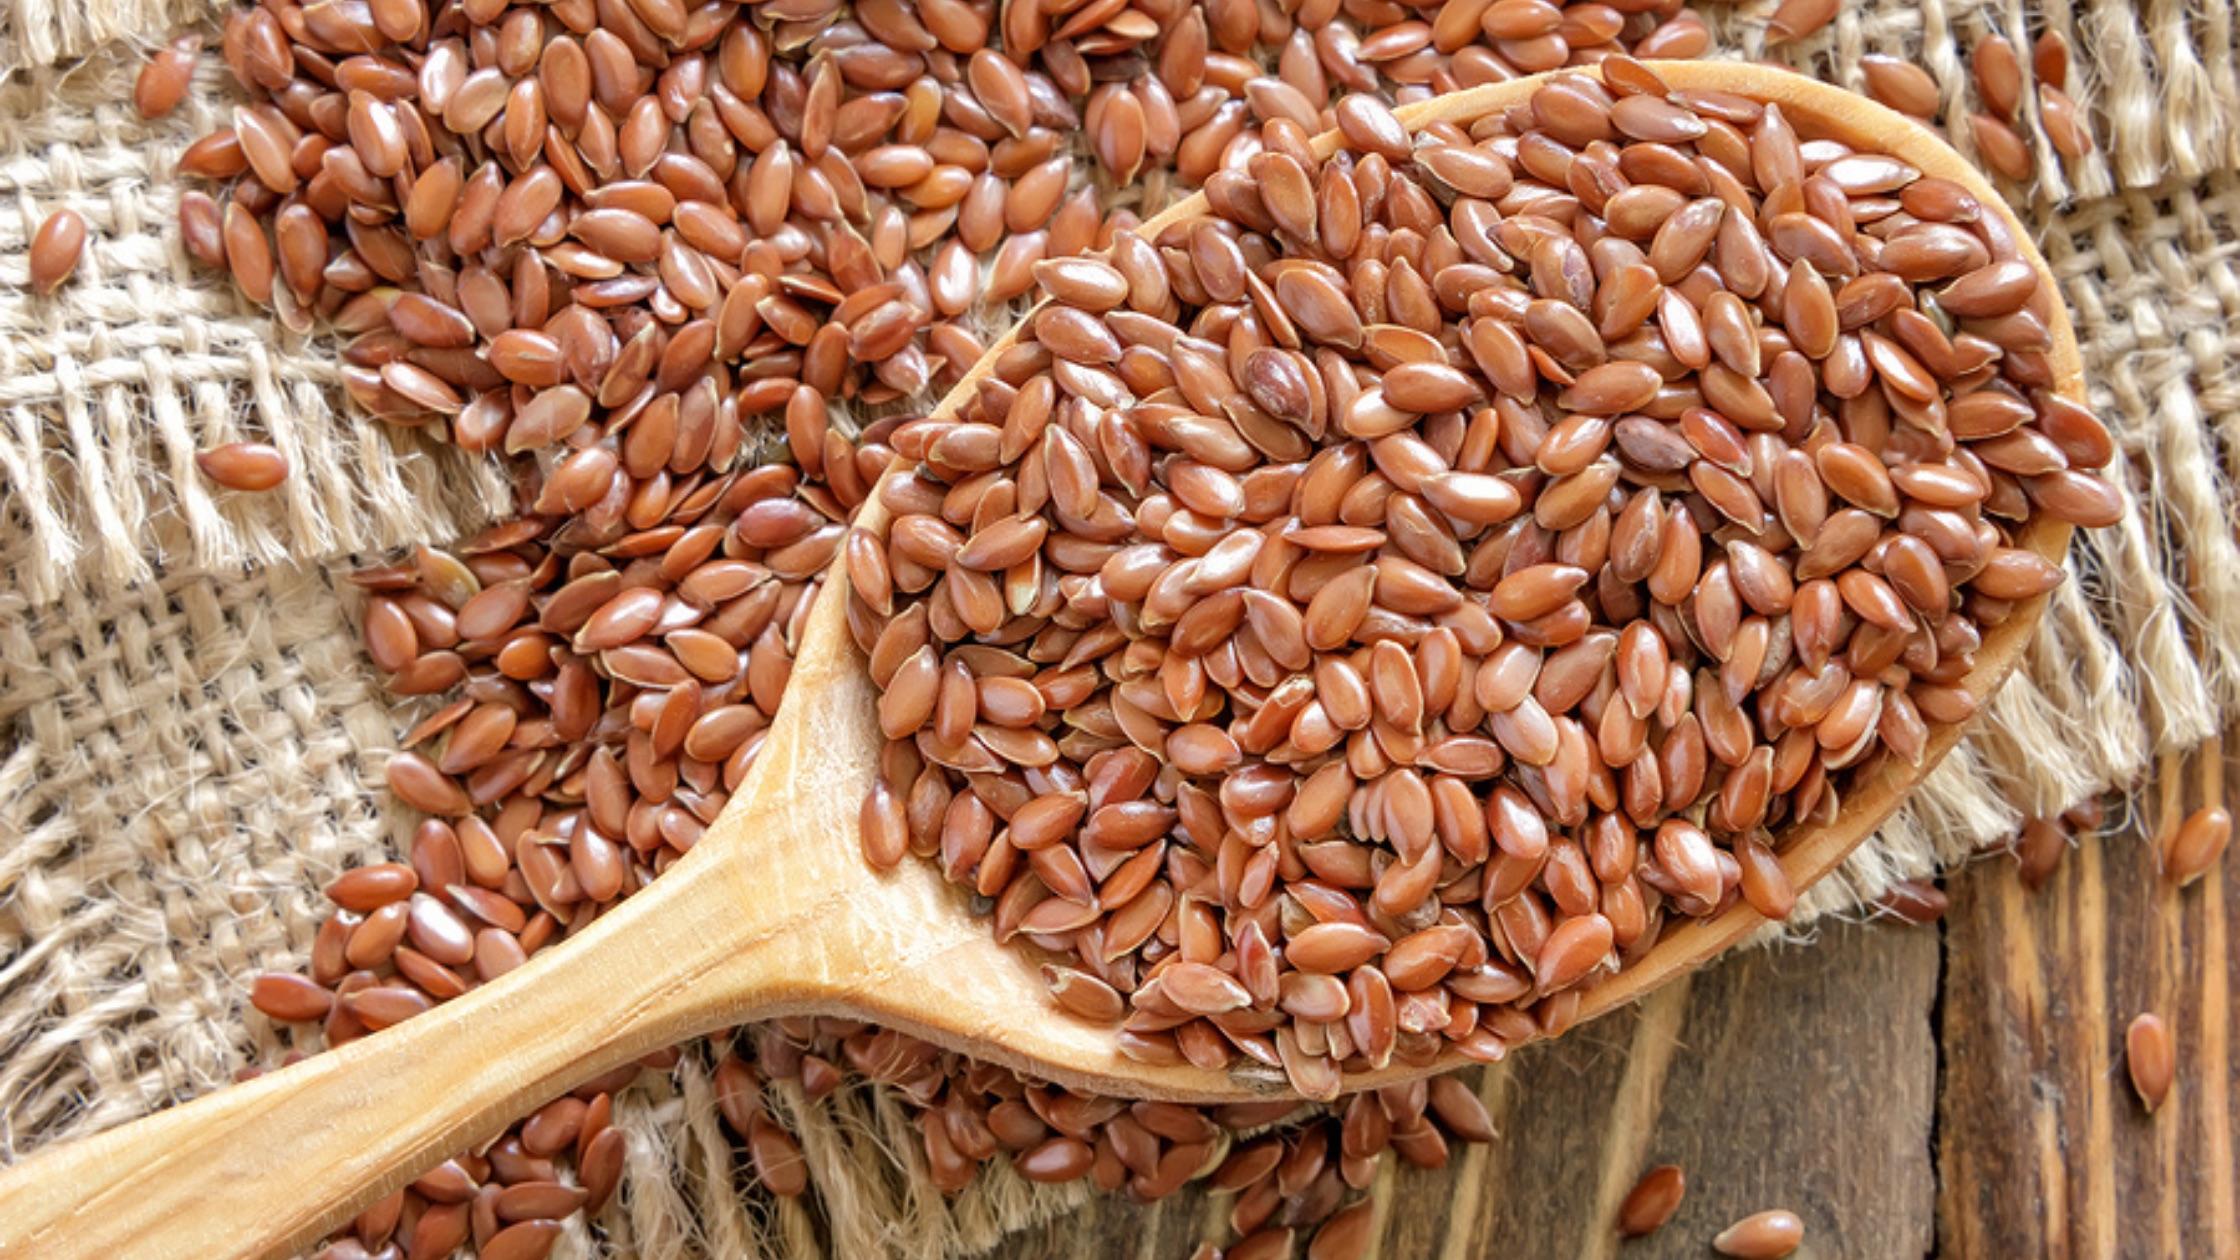 5 Ways Flaxseeds Help with Hormone Balance - Aviva Romm MD